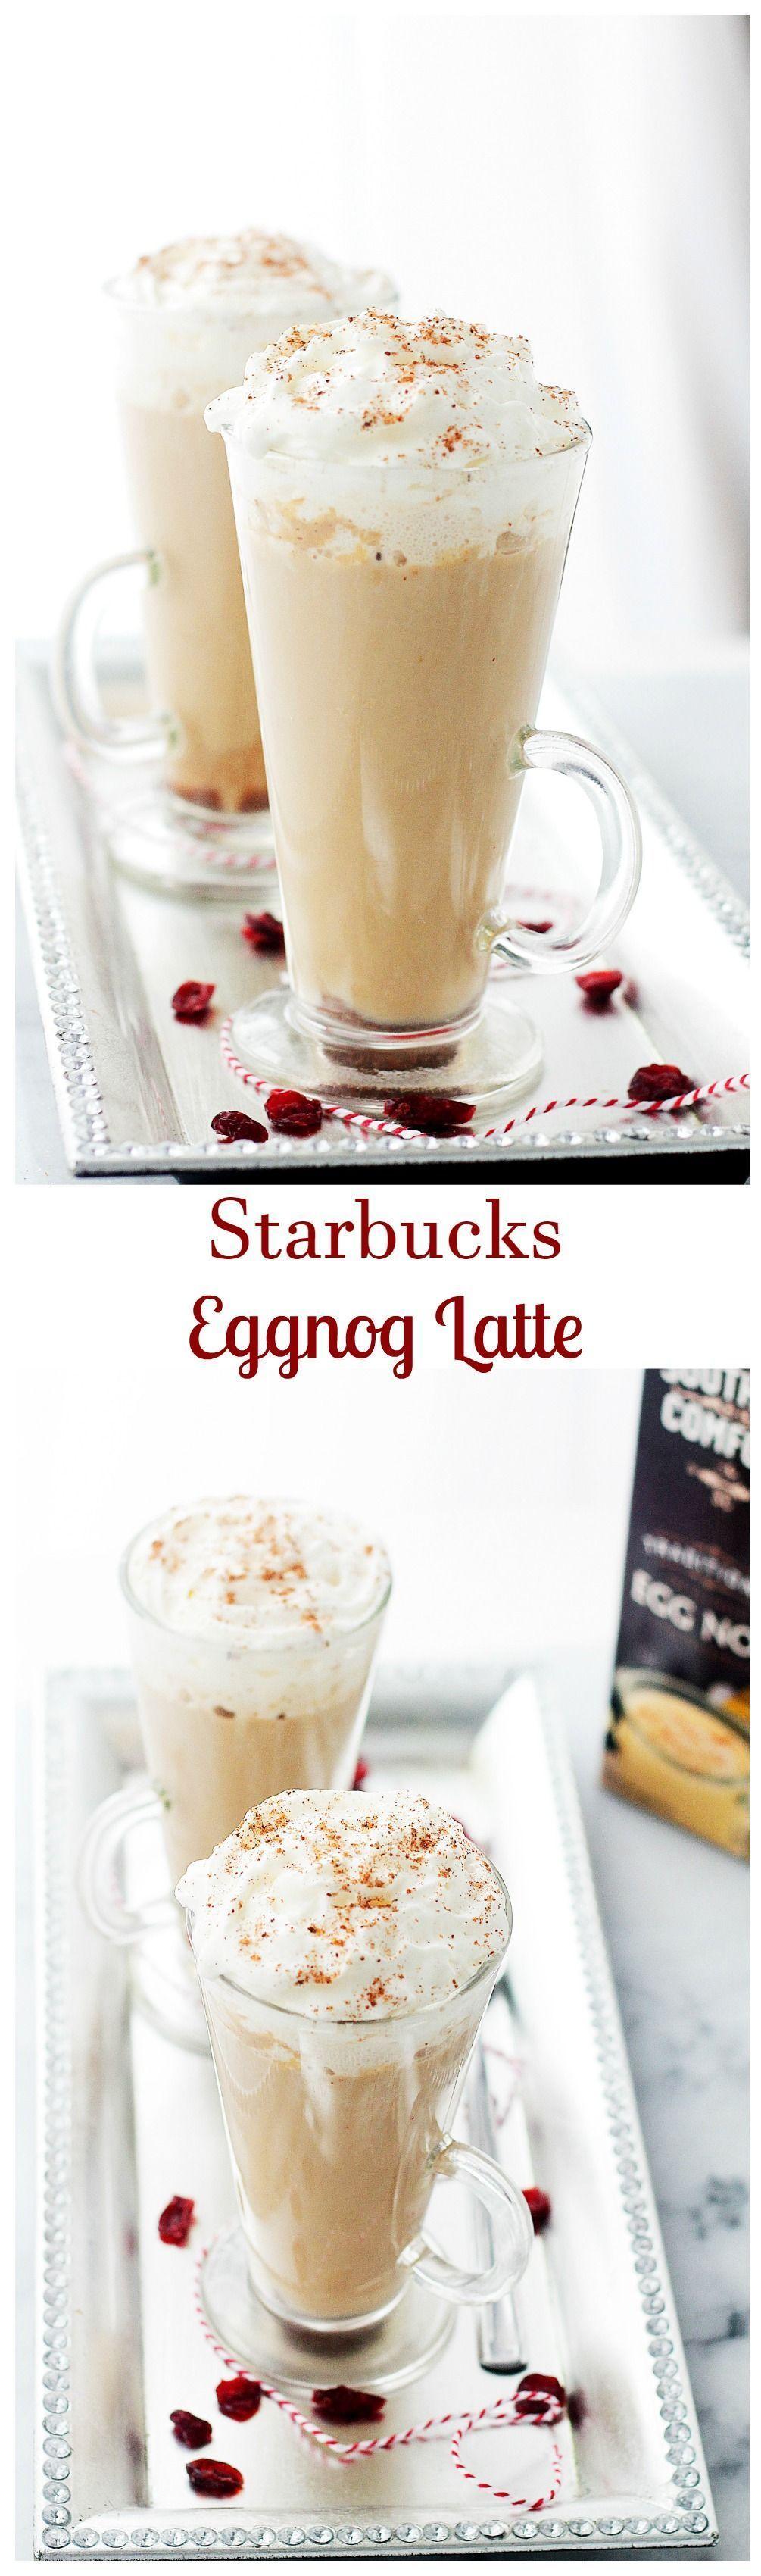 #starbucksinspired #starbucks #delicious #yourself #espresso #steamed #festive #eggnog #nutmeg #strong #brewed #latte #brown #sugar #homeStarbucks Eggnog Latte - This festive, Starbucks-inspired latte is made with strong brewed espresso, steamed eggnog and milk. Brown sugar and nutmeg, too. Save yourself 5$ and make it at home - it's delicious!! #espressoathome #starbucksinspired #starbucks #delicious #yourself #espresso #steamed #festive #eggnog #nutmeg #strong #brewed #latte #brown #sugar #hom #espressoathome